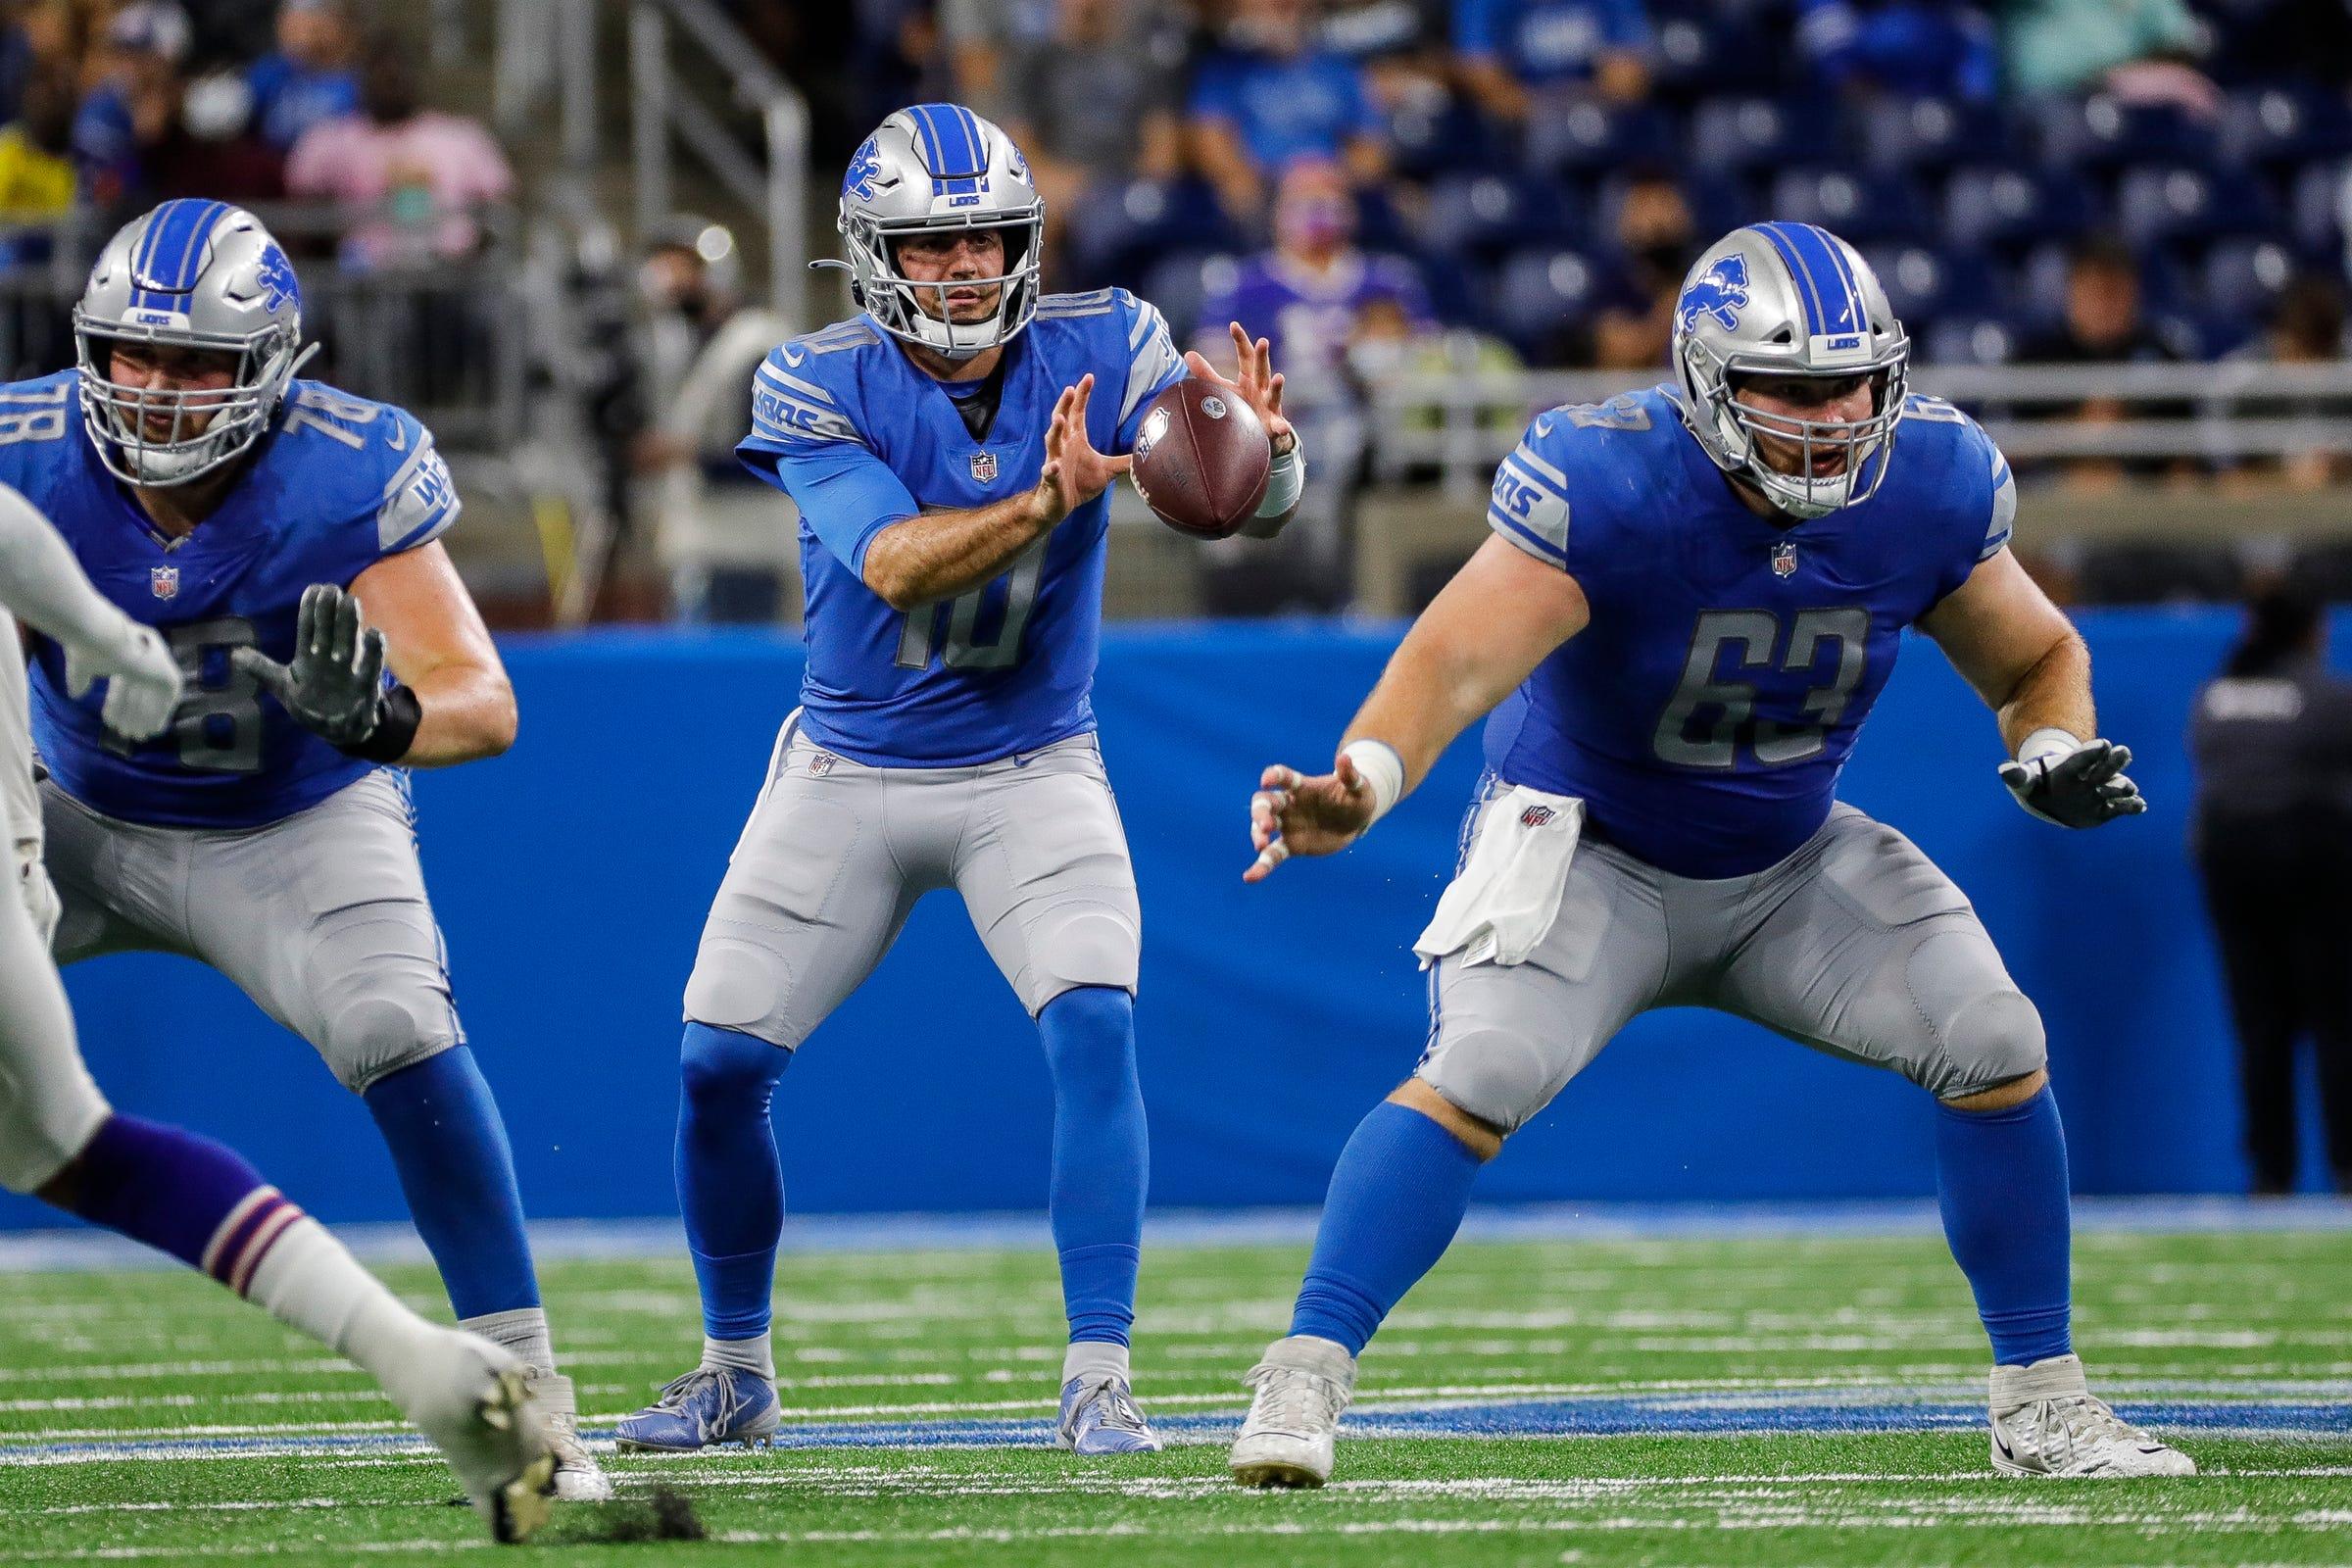 Detroit Lions turn to NFL journeyman Evan Brown to replace Pro Bowl C Frank Ragnow